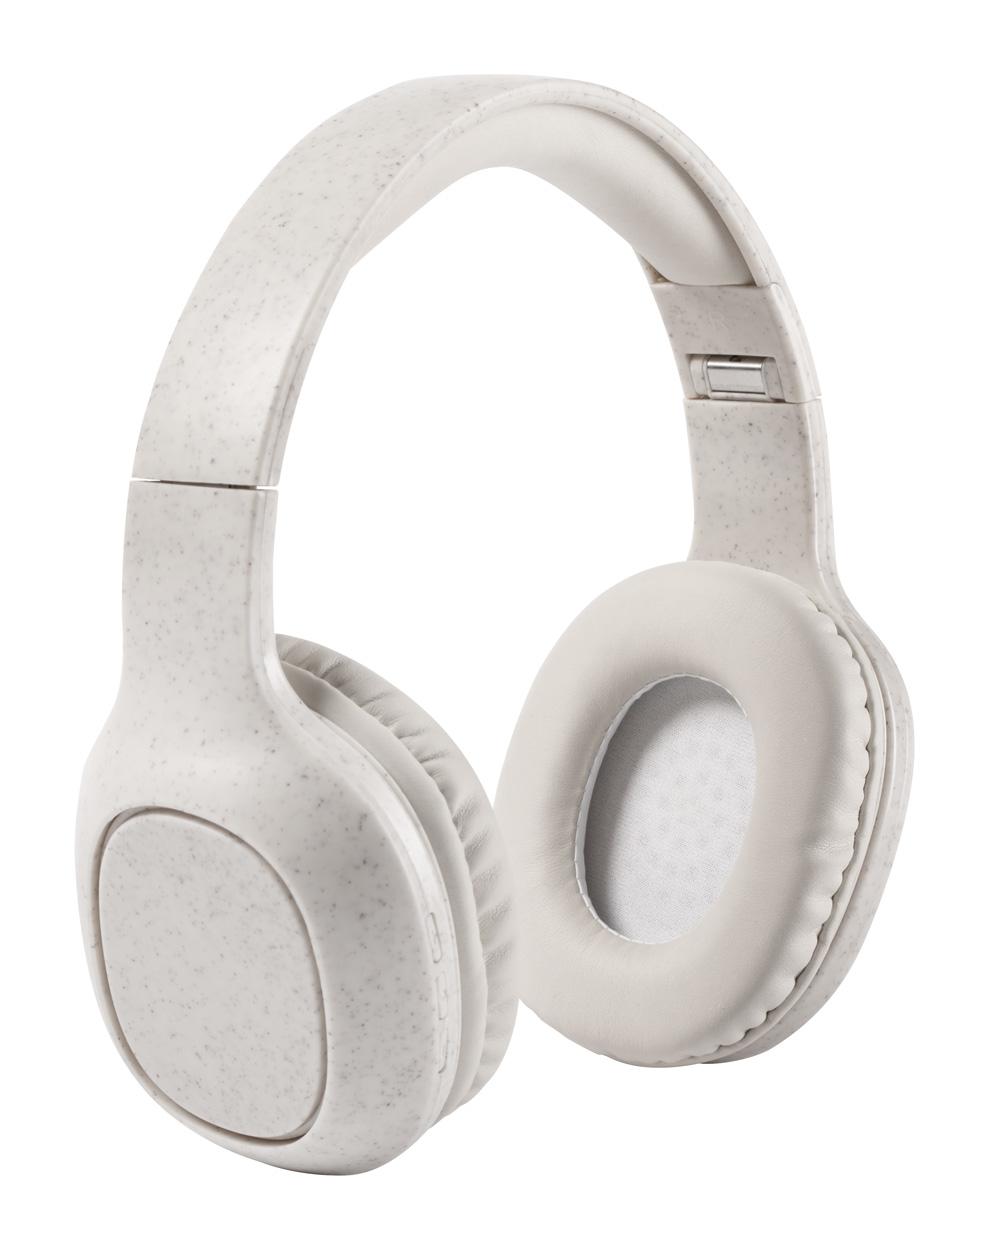 Datrex bluetooth headphones